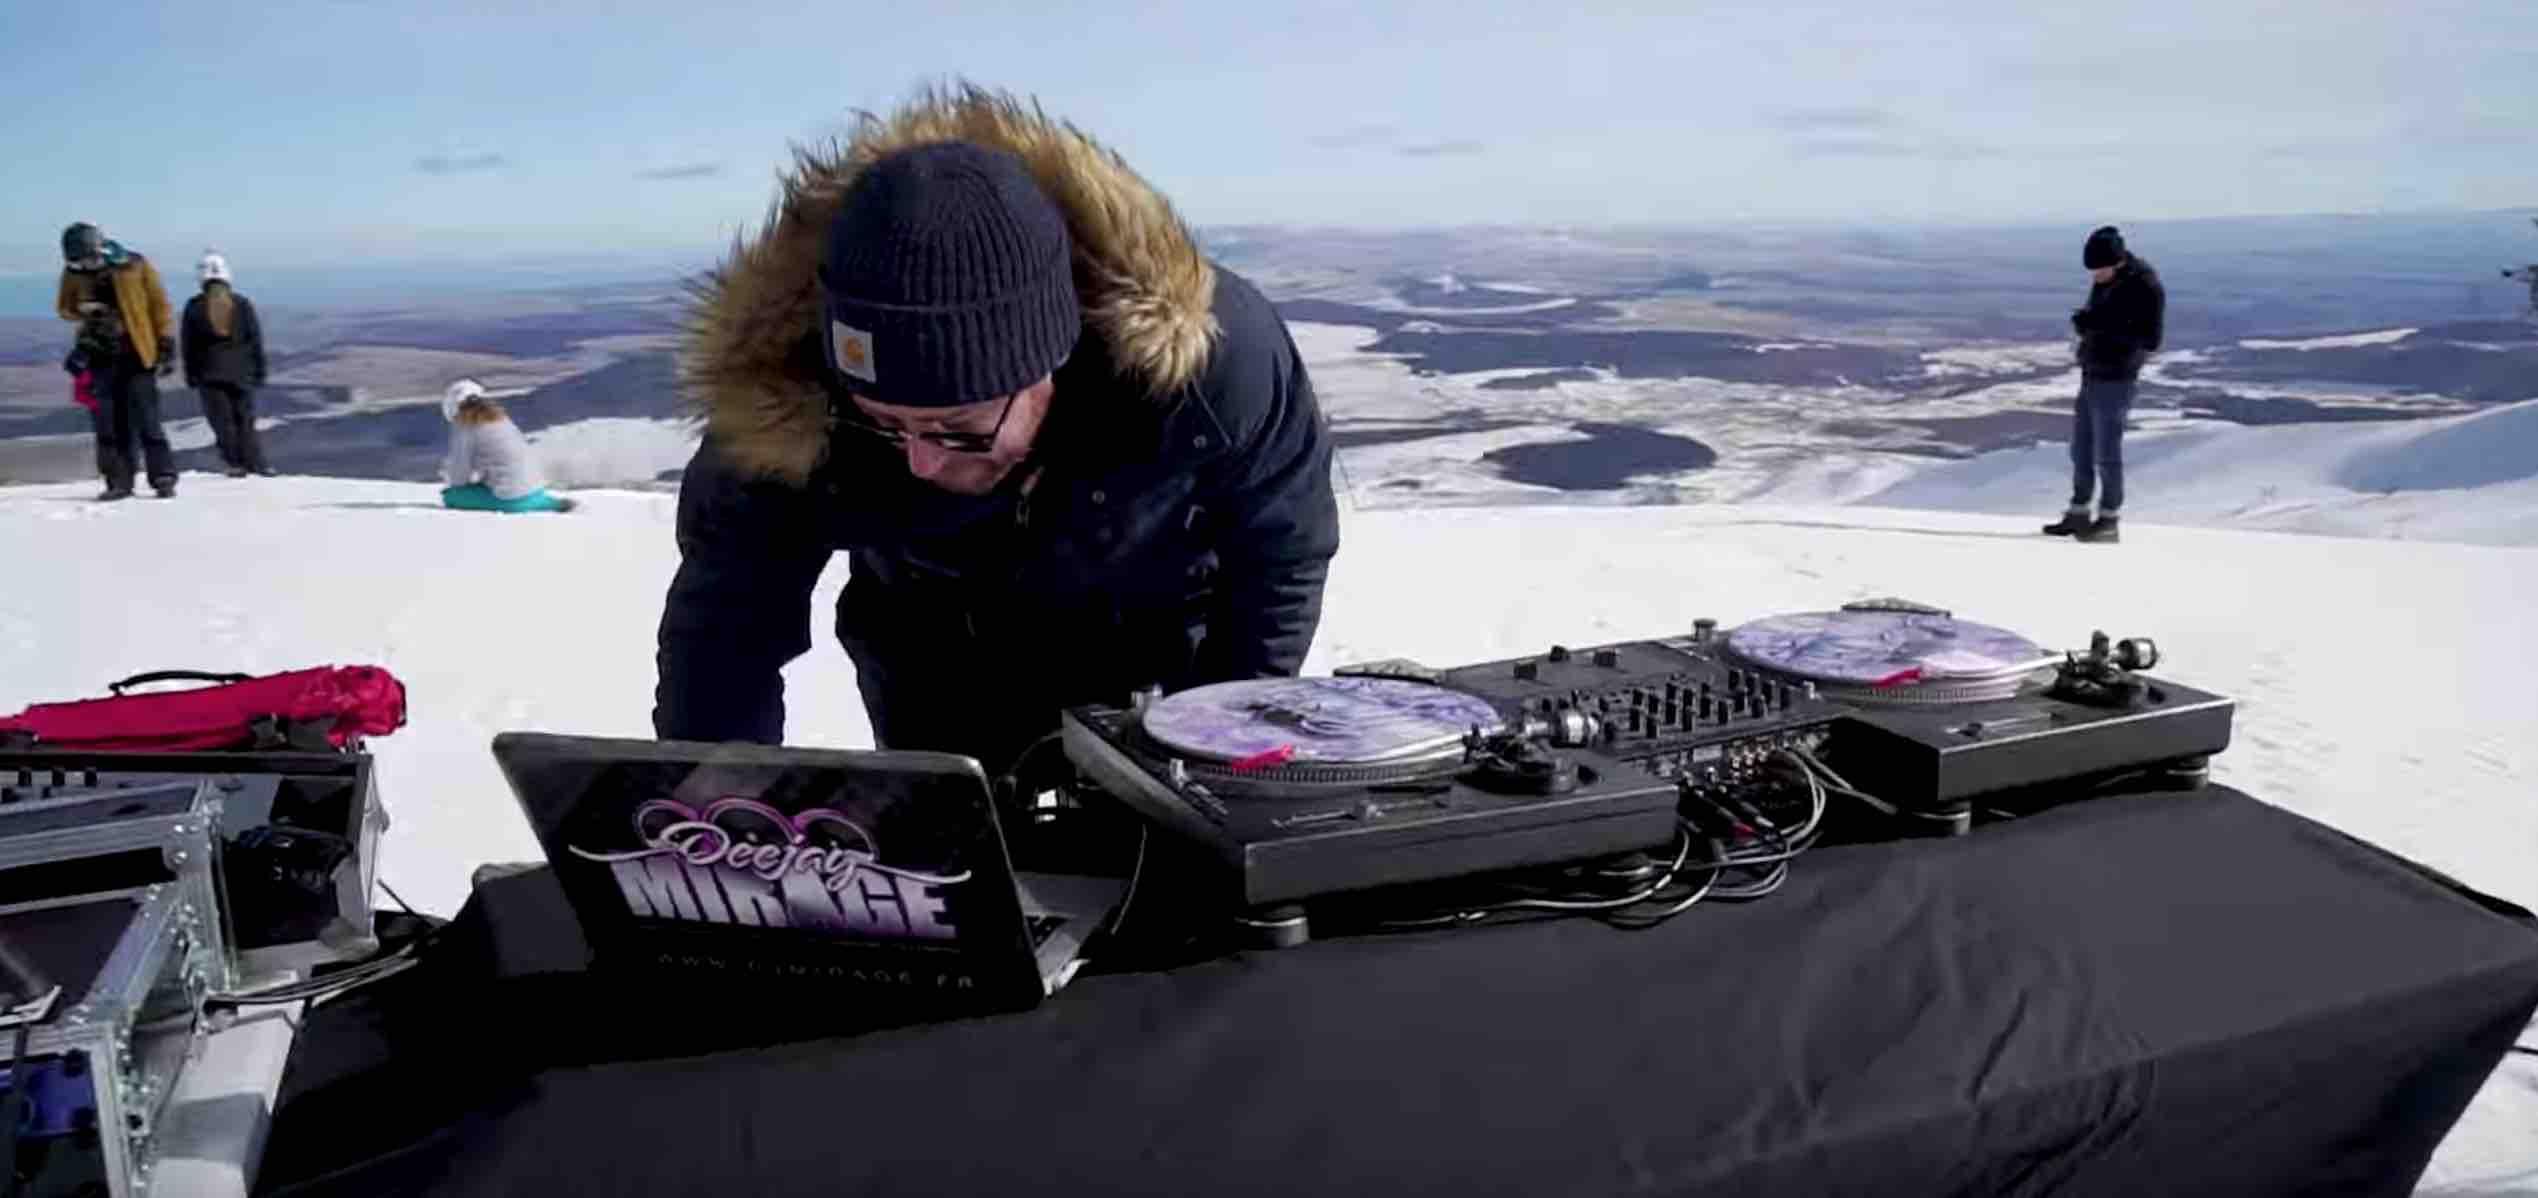 DJ MIRAGE + Max Lemer @ Sommet Super-Besse